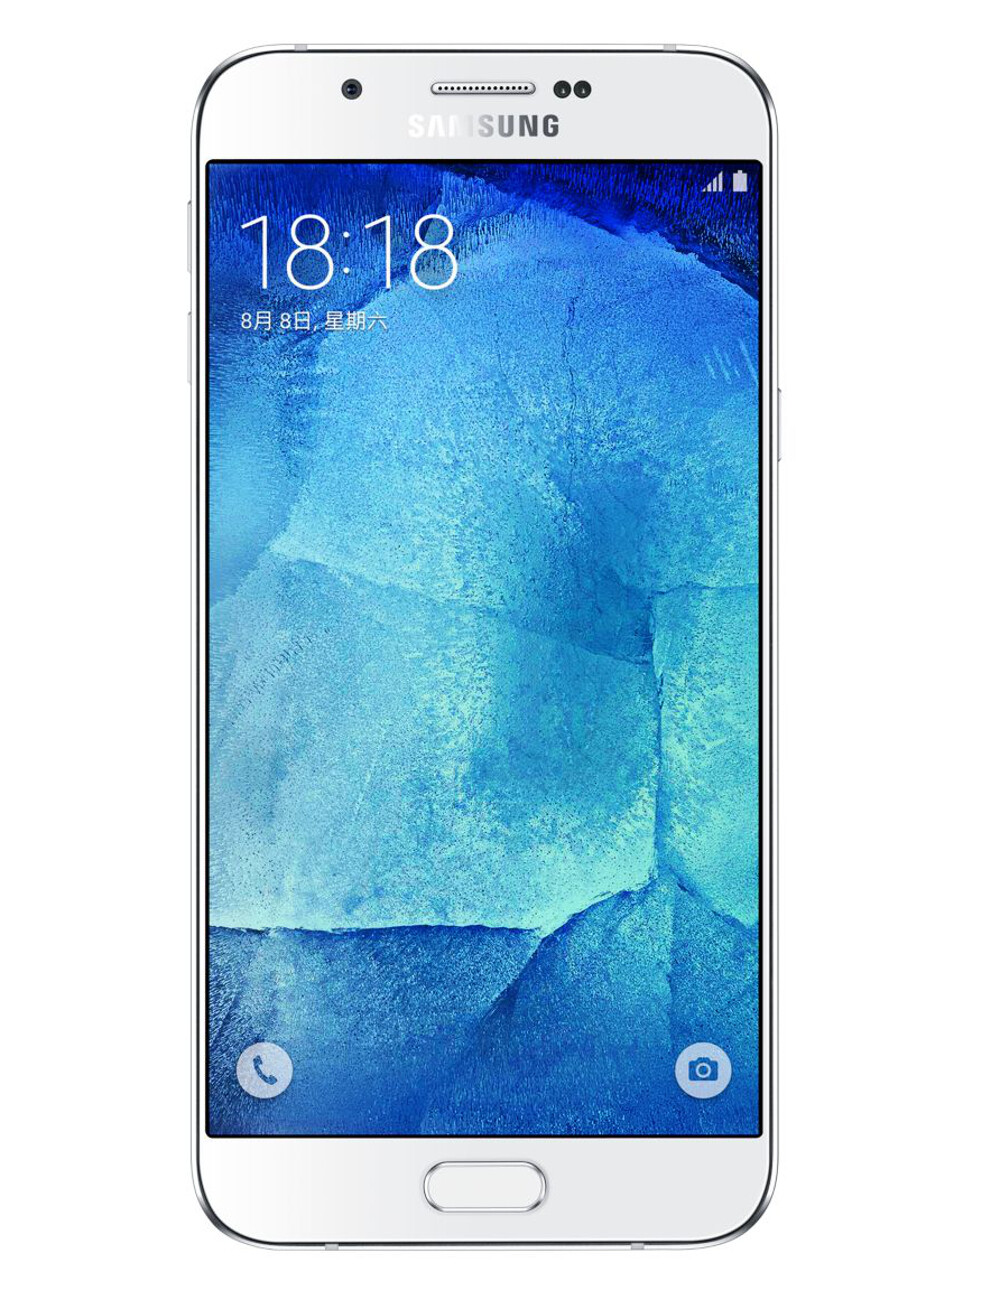 Samsung Galaxy A8 specs